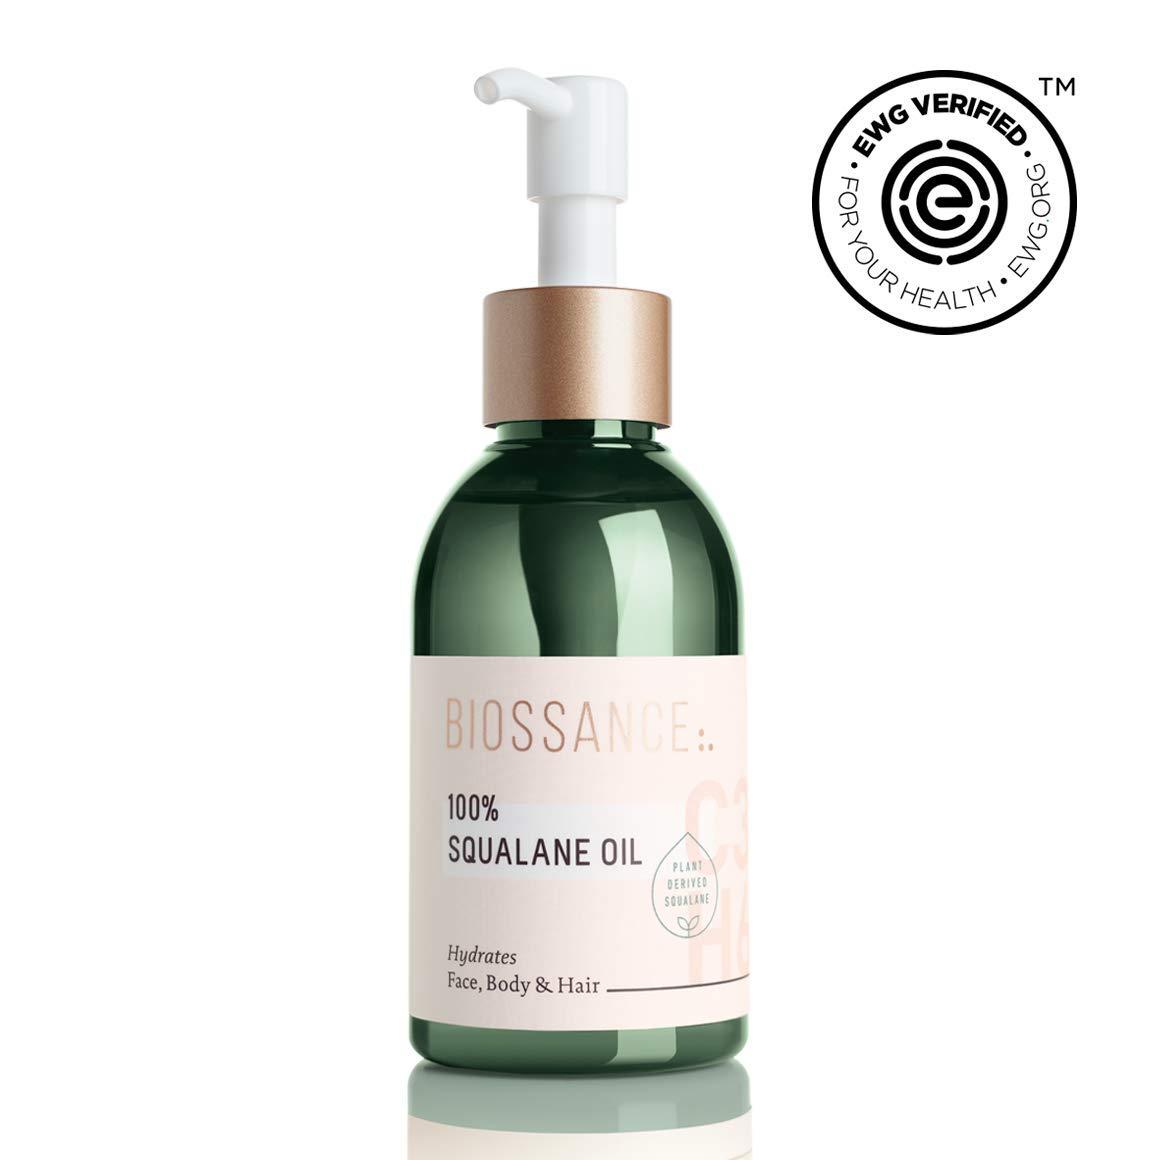 Biossance 100% Squalane Oil 100ml ビオッサンス スクワランオイル B07SJ6QXKS